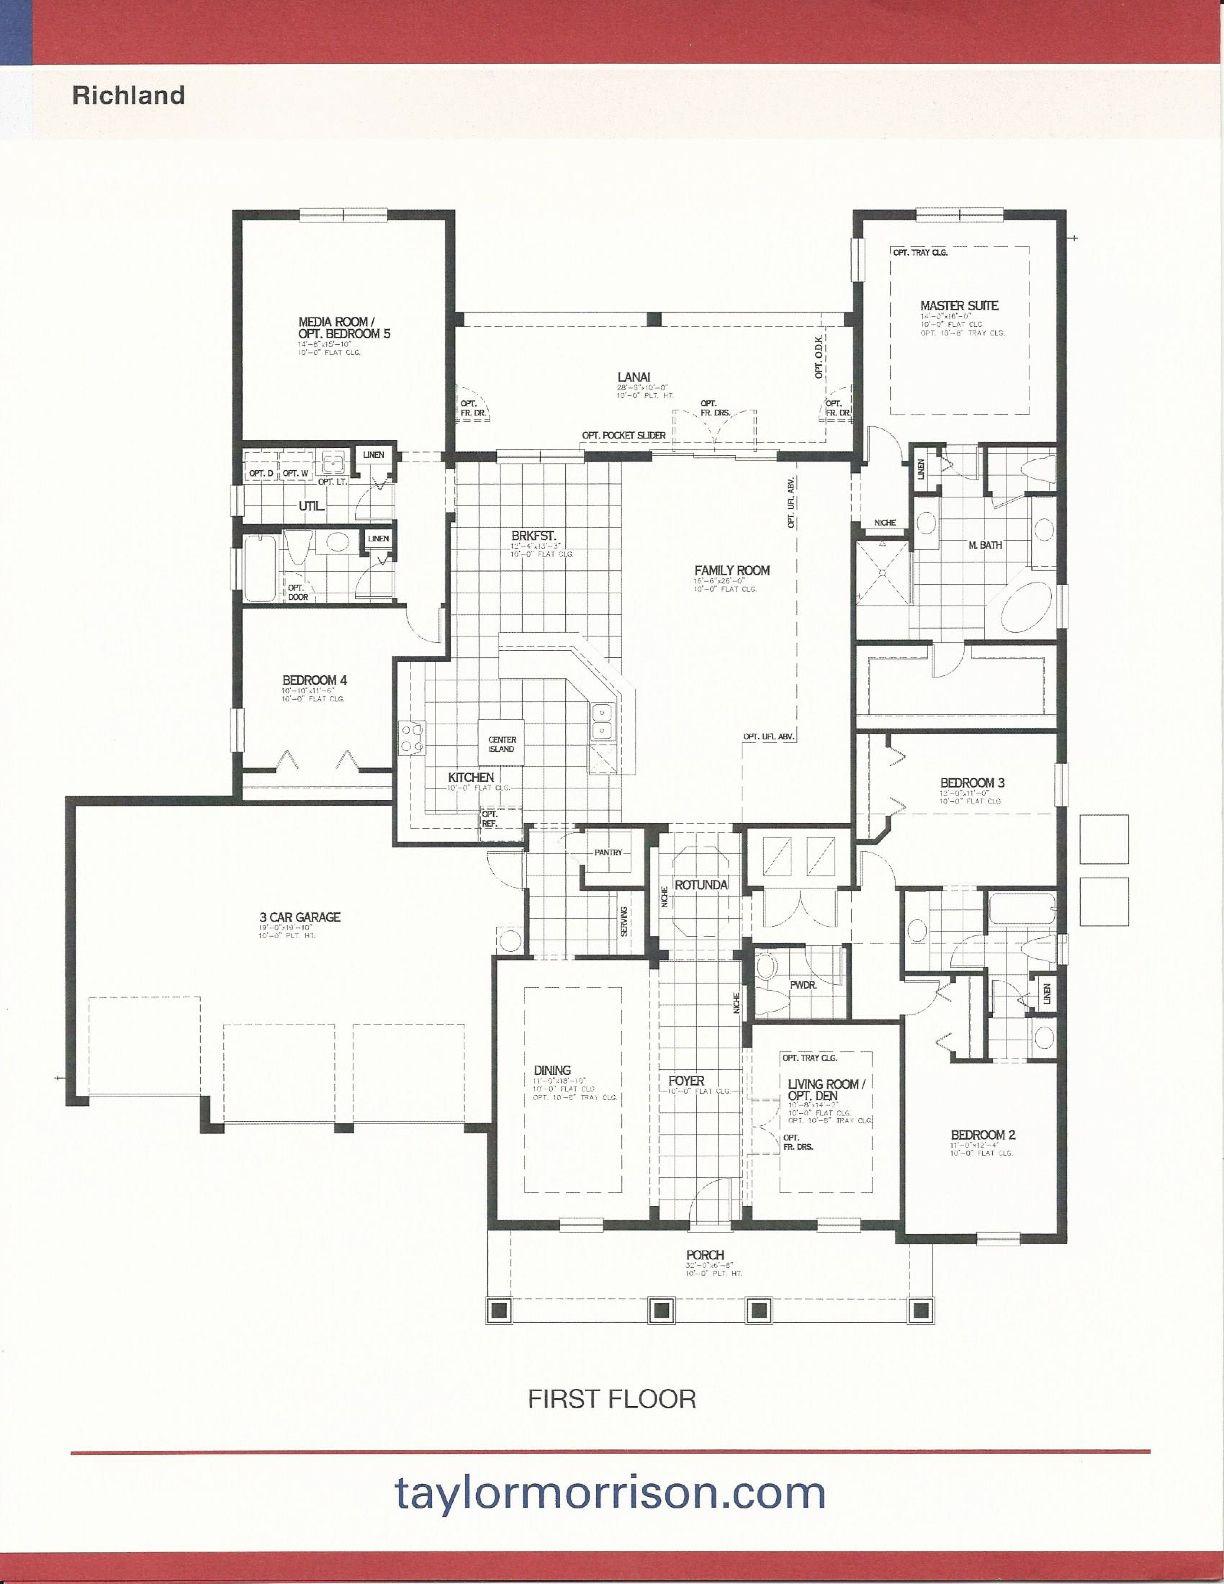 Taylor Morrison Homes In Independence Richard Floor Plan In Winter Garden Fl Garden Design Plans Winter Garden Garden Design